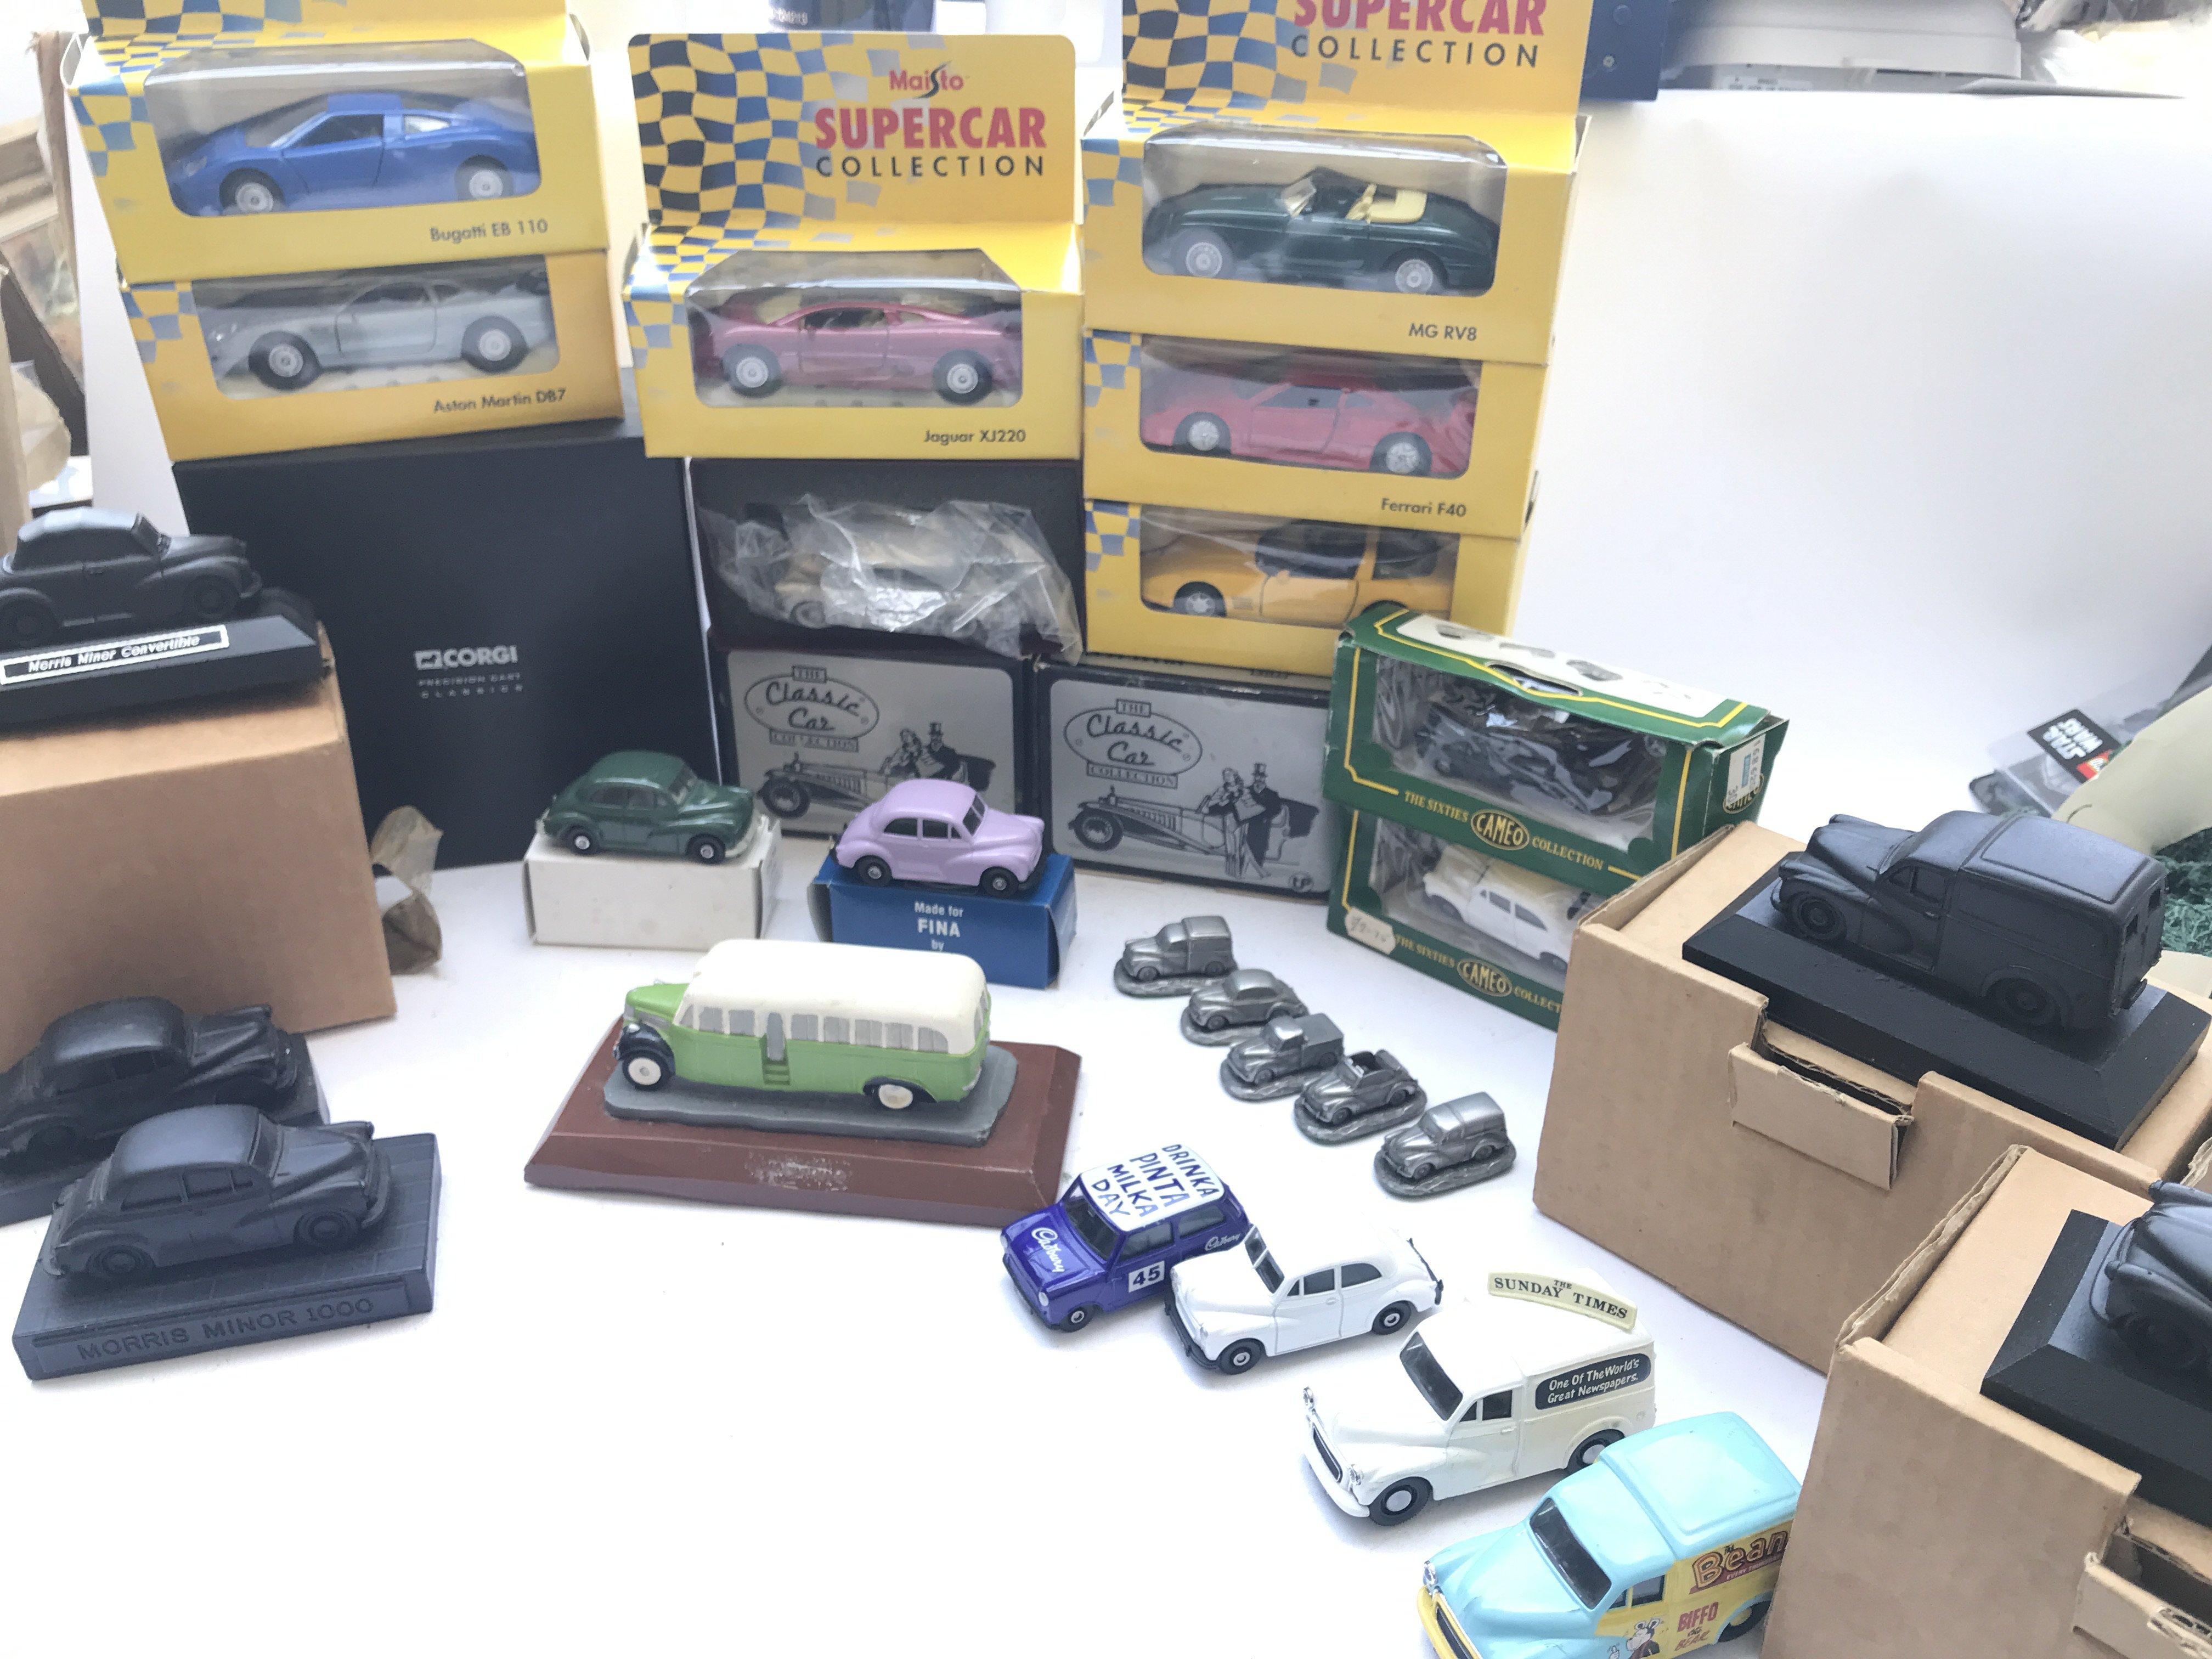 A Box Containing A Collection of Morris Minor Coal